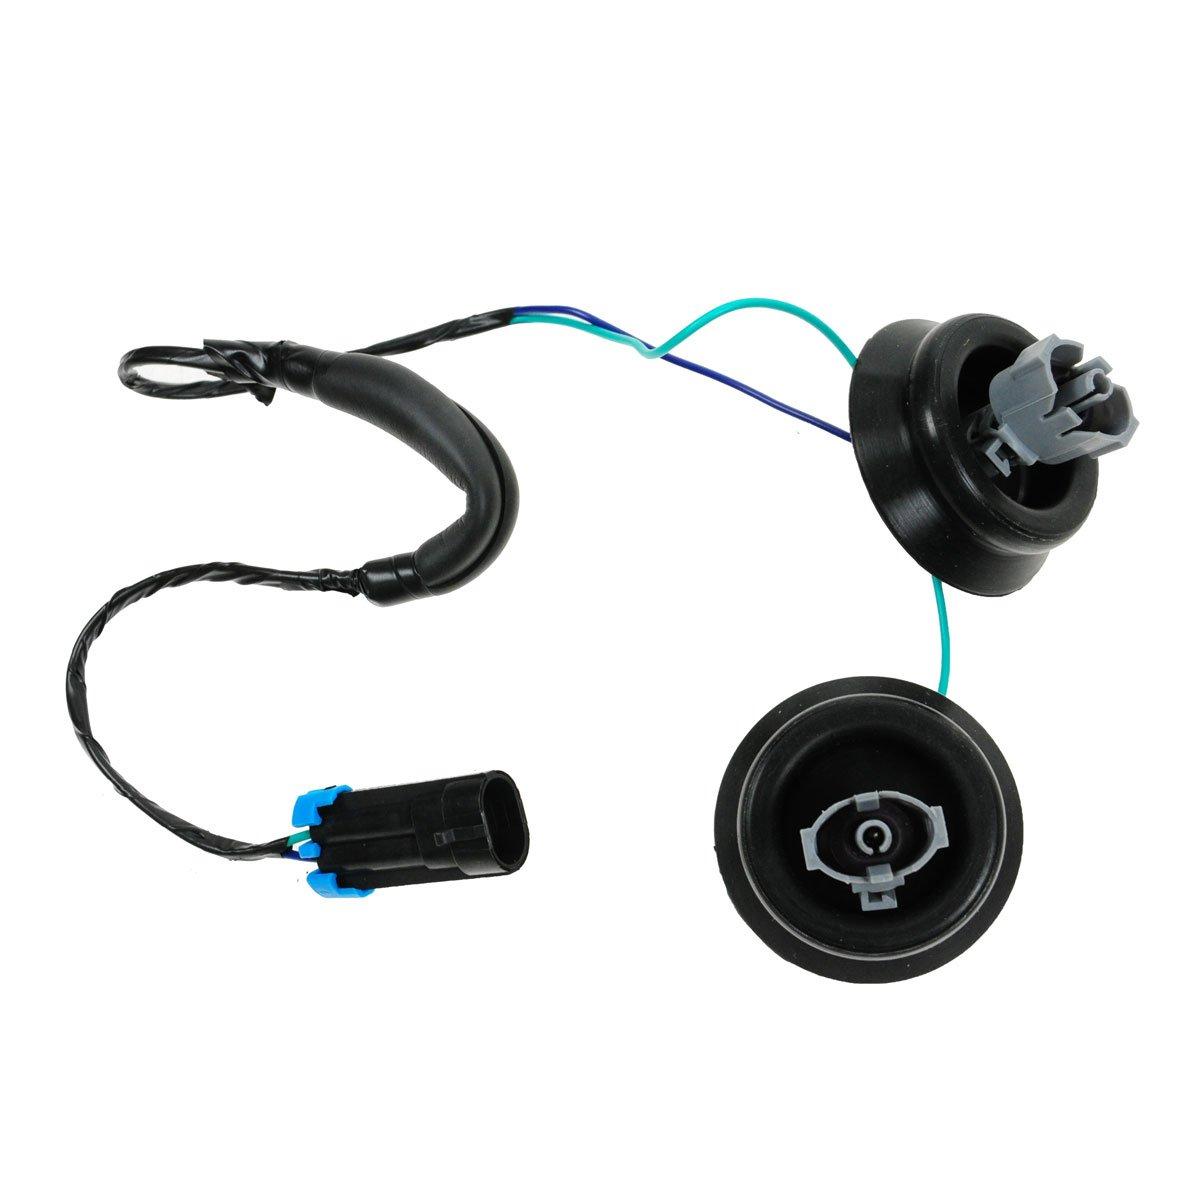 Knock Sensor with Harness Pair Kit Set for Chevy GMC Silverado Sierra Cadillac